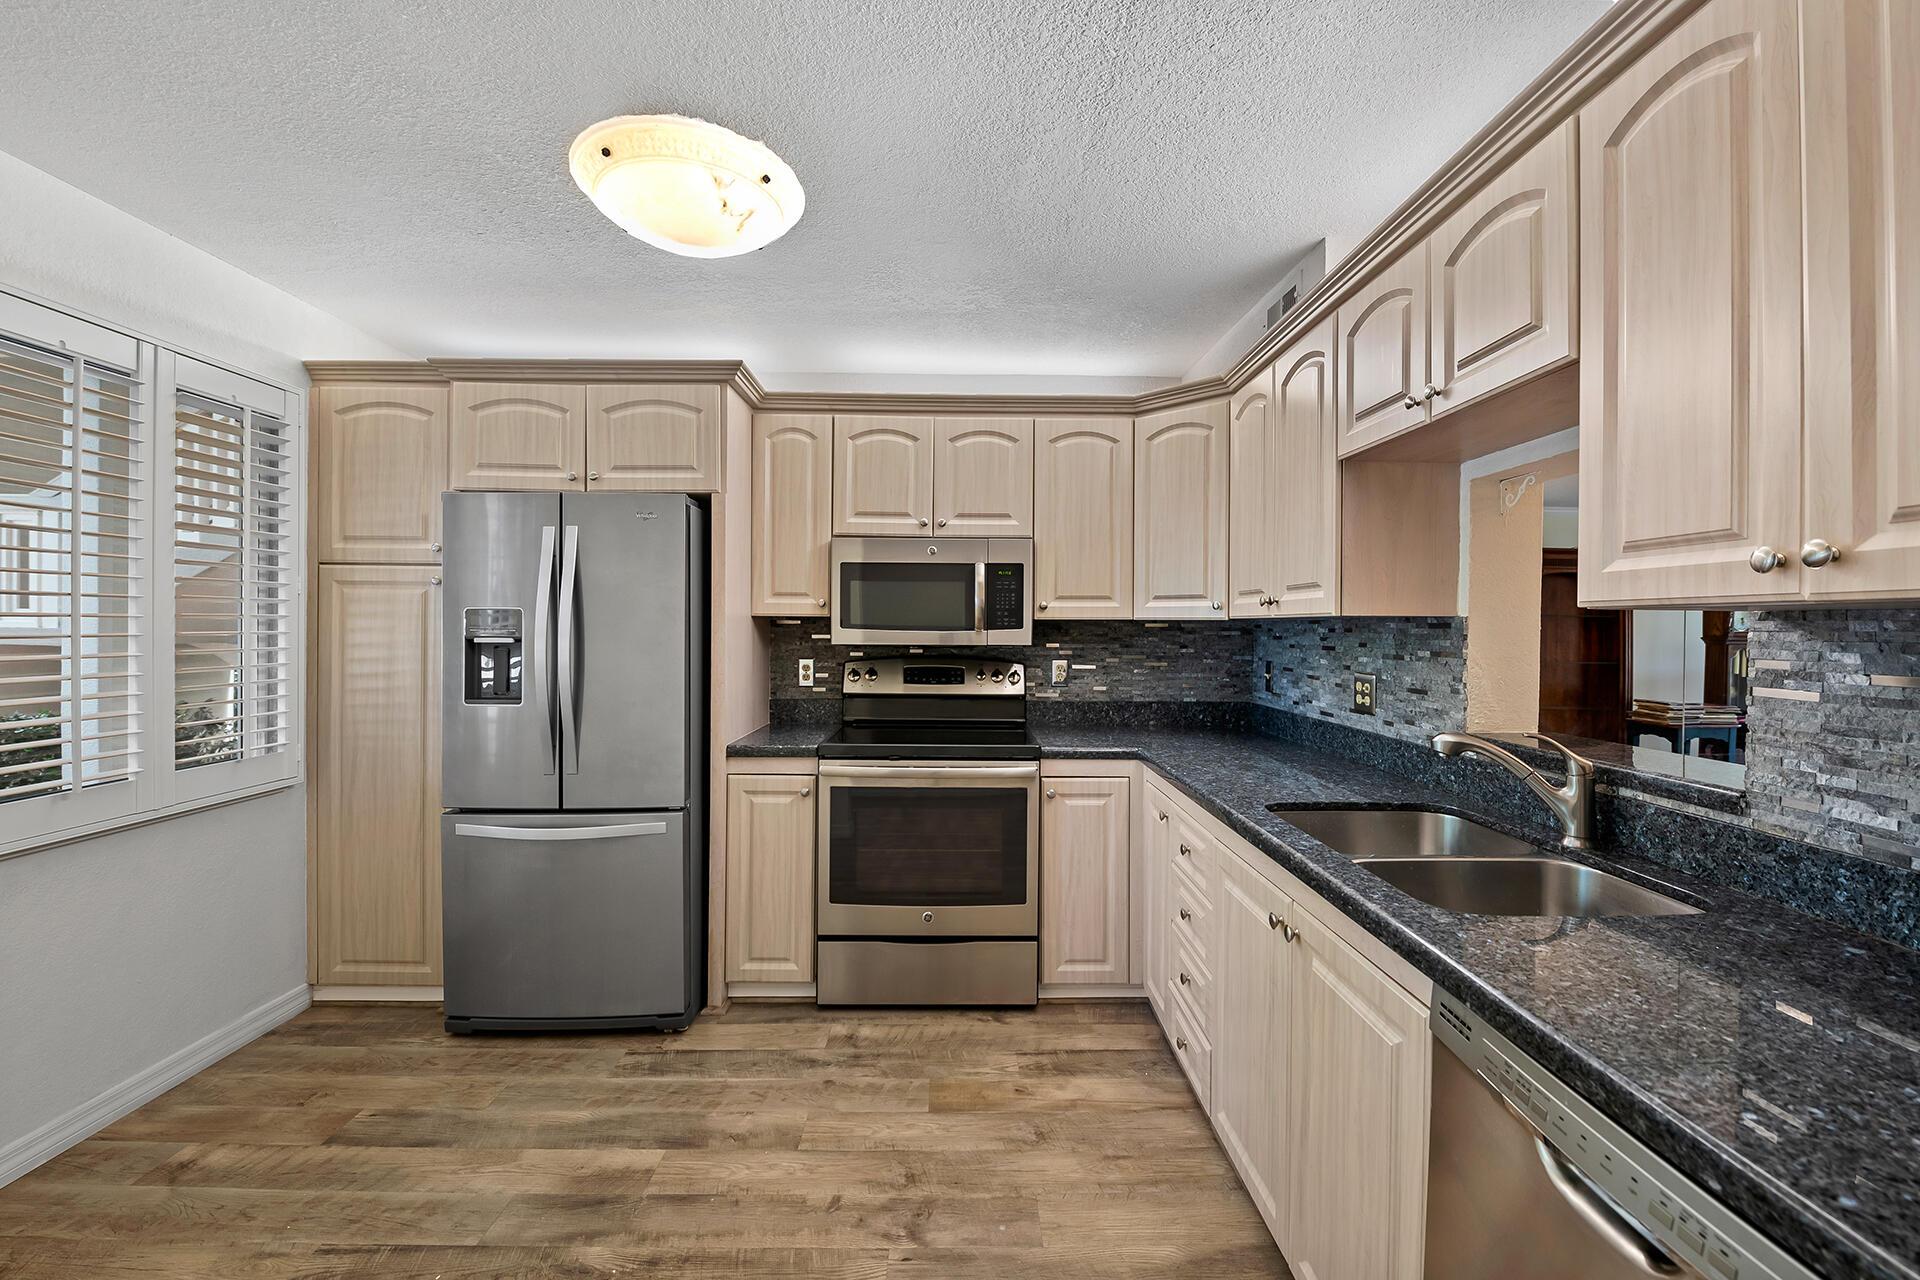 Home for sale in Wynmoor Village - Bimini Coconut Creek Florida